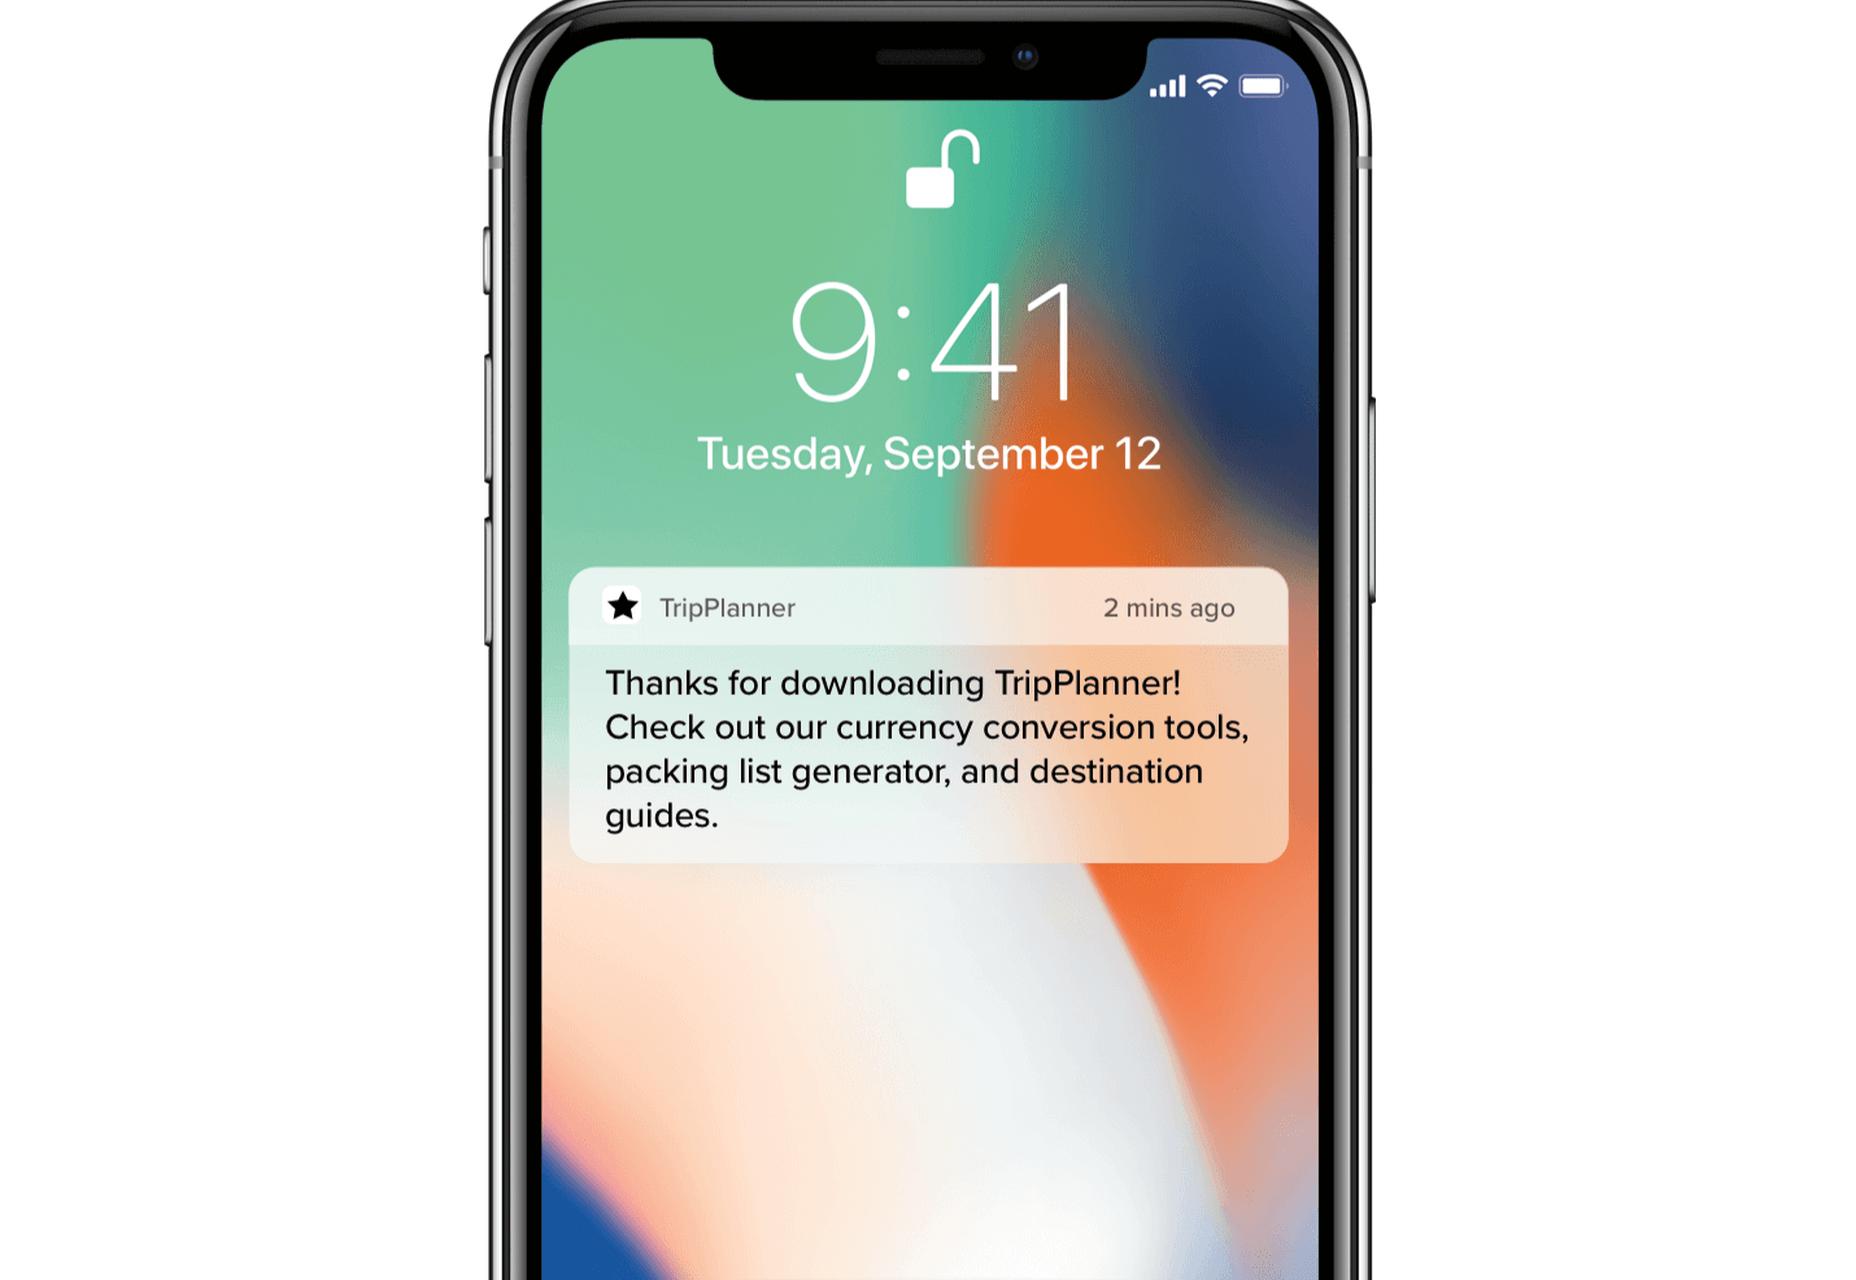 TripPlanner Notification